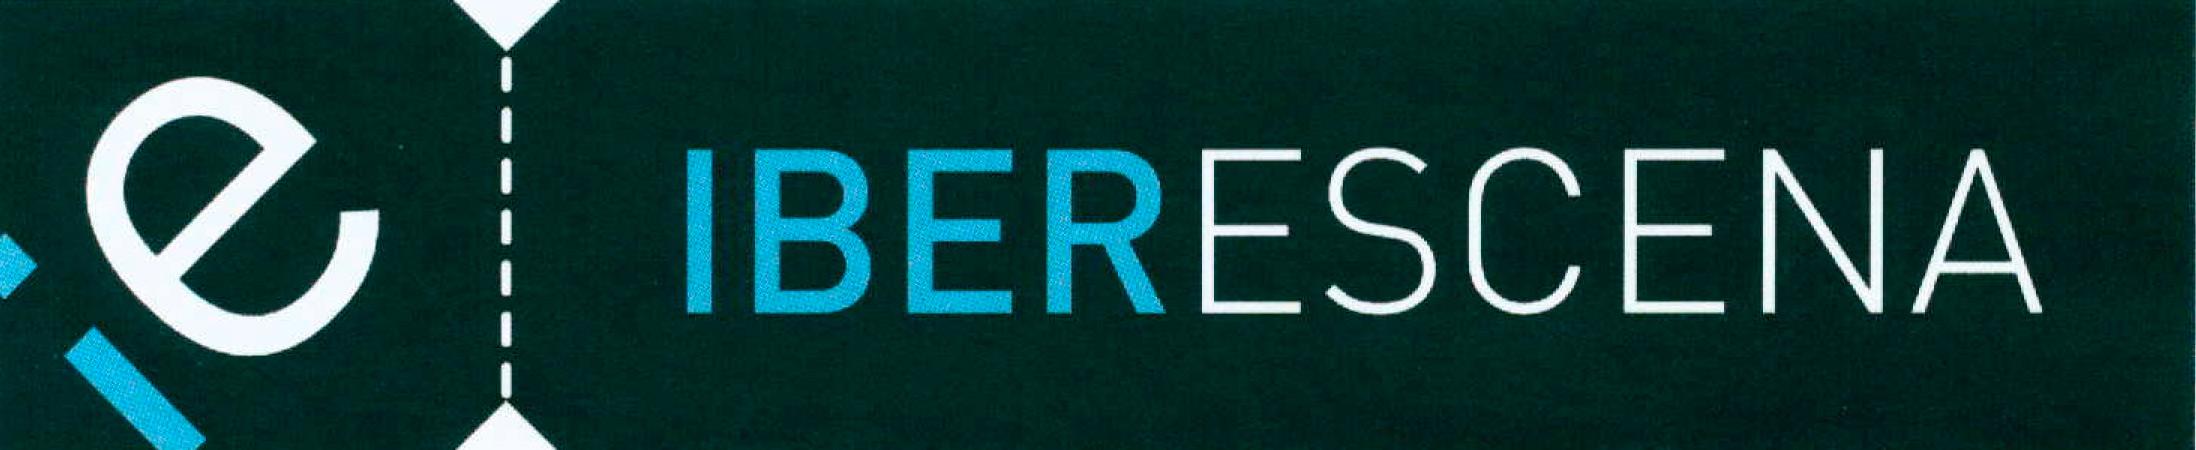 Logo de Iberescena